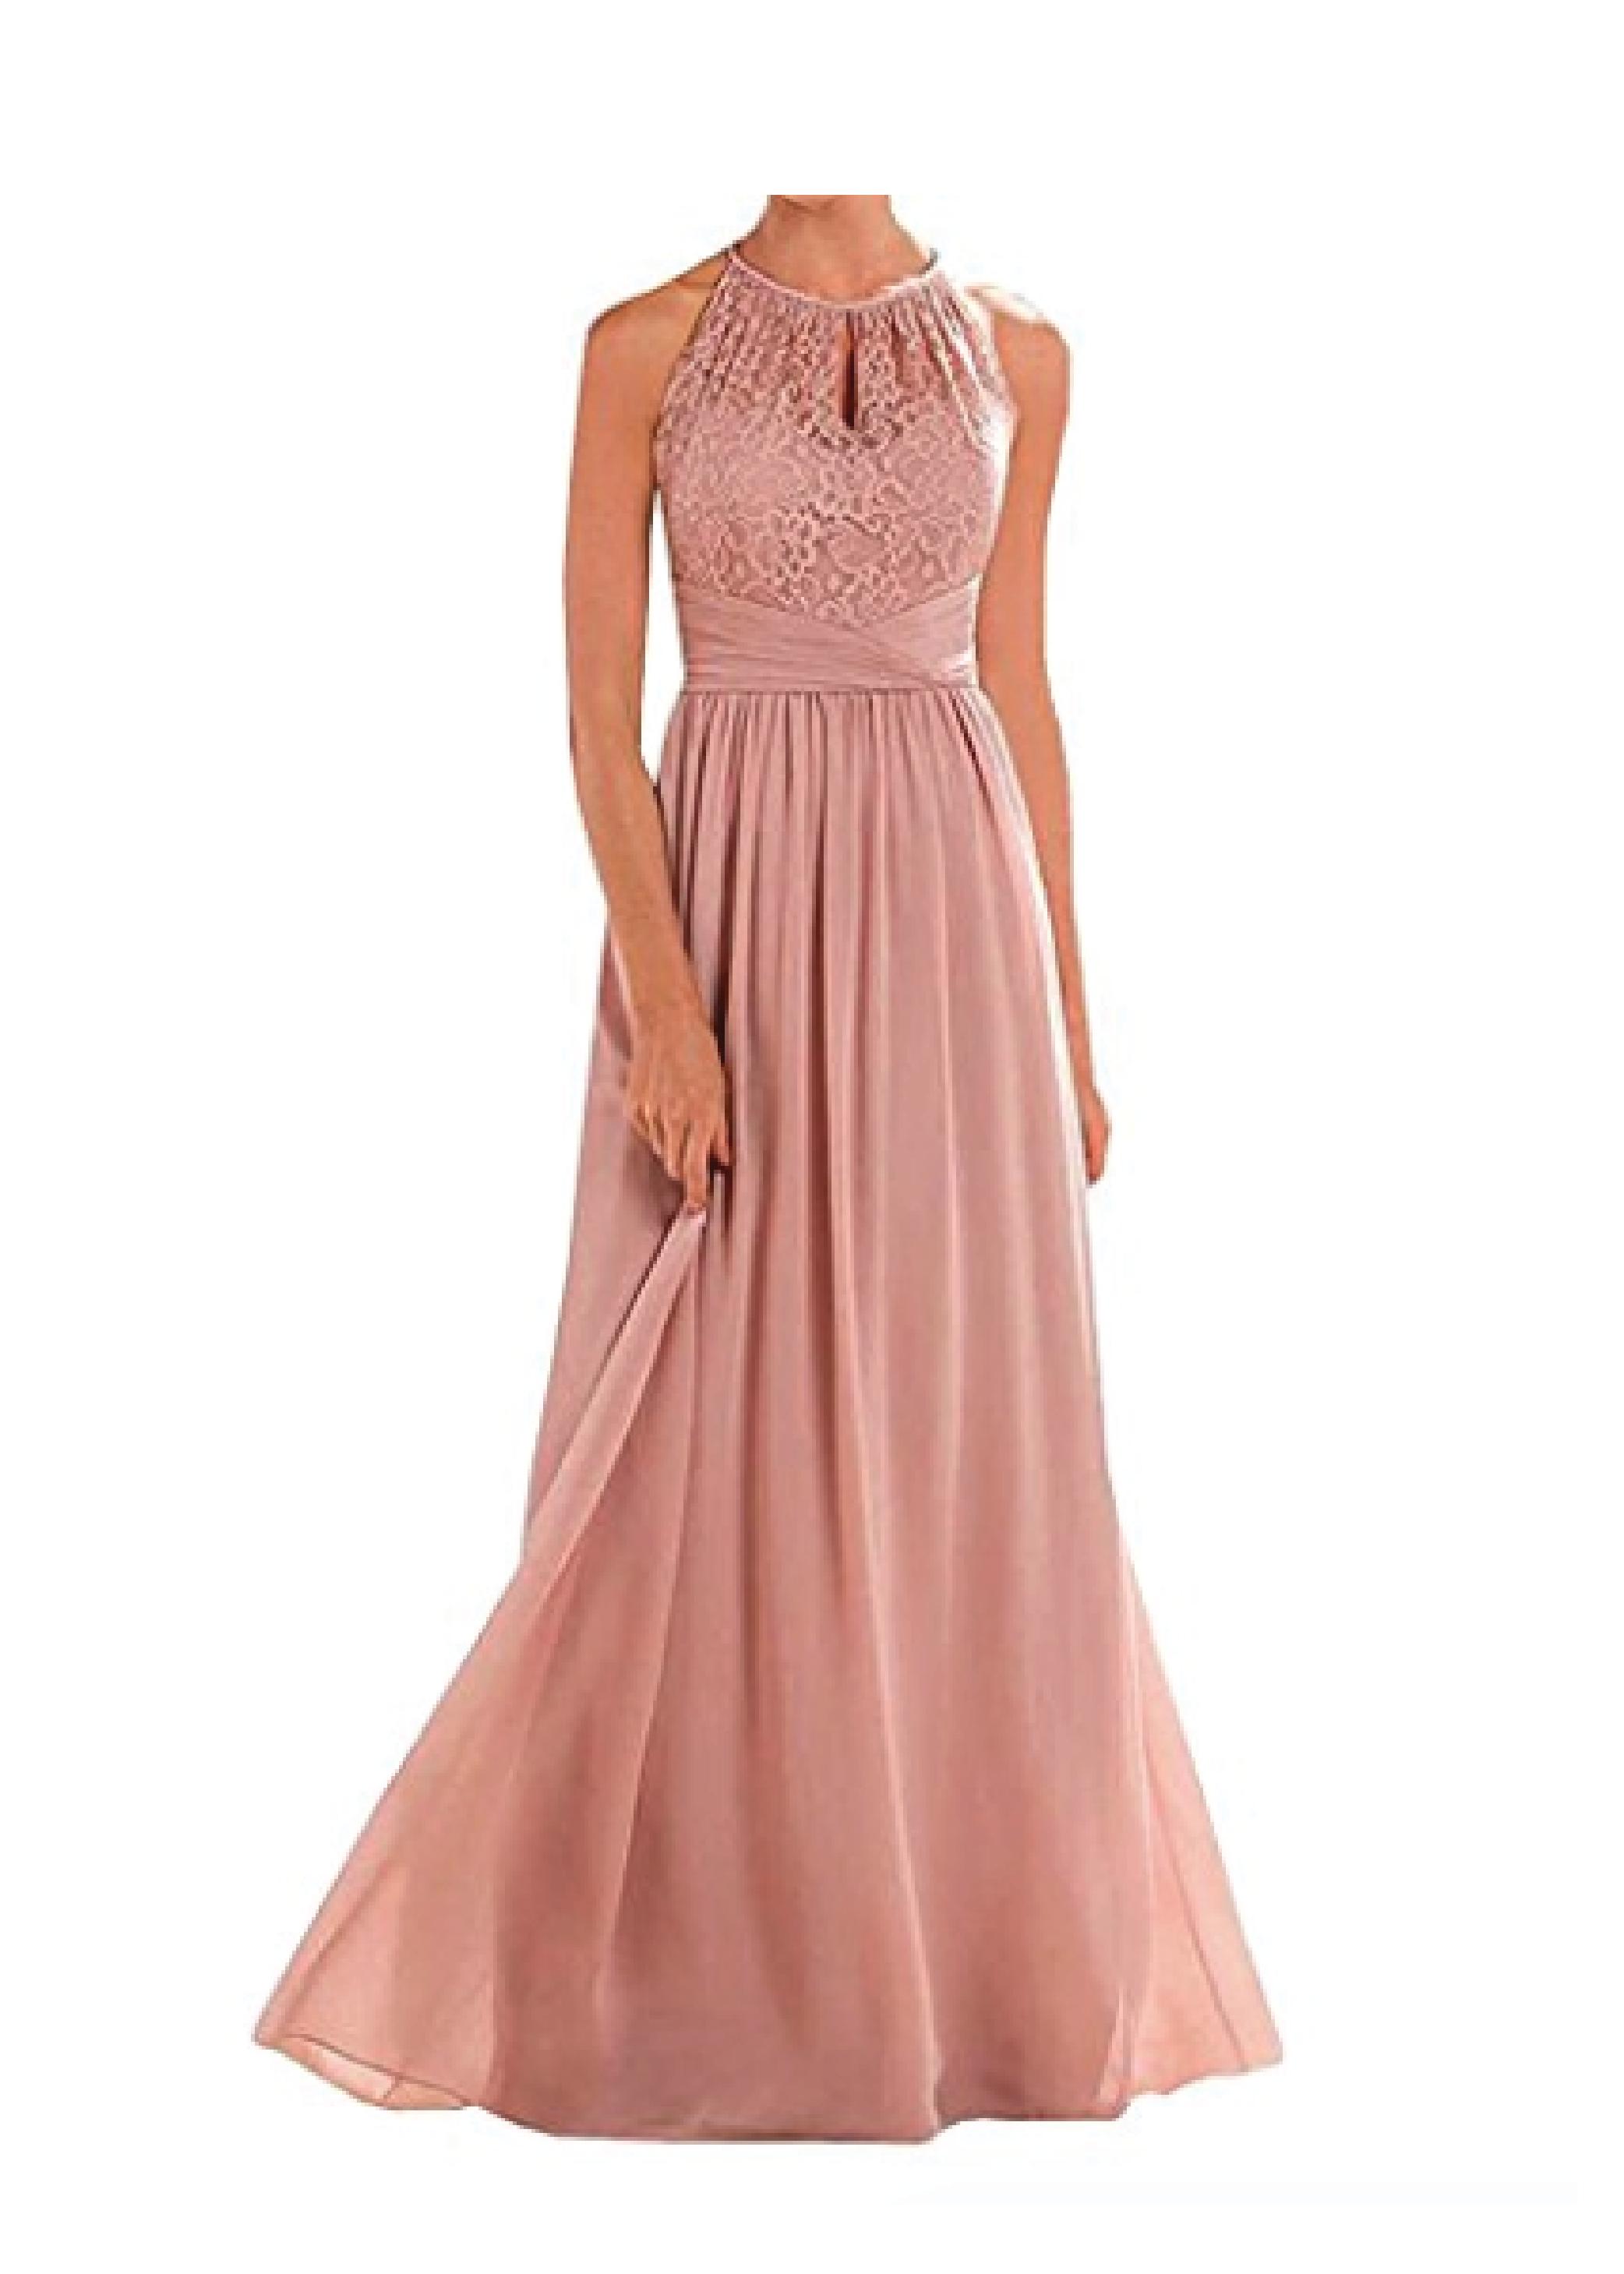 Top Bridesmaid Dresses Under 100-02.png